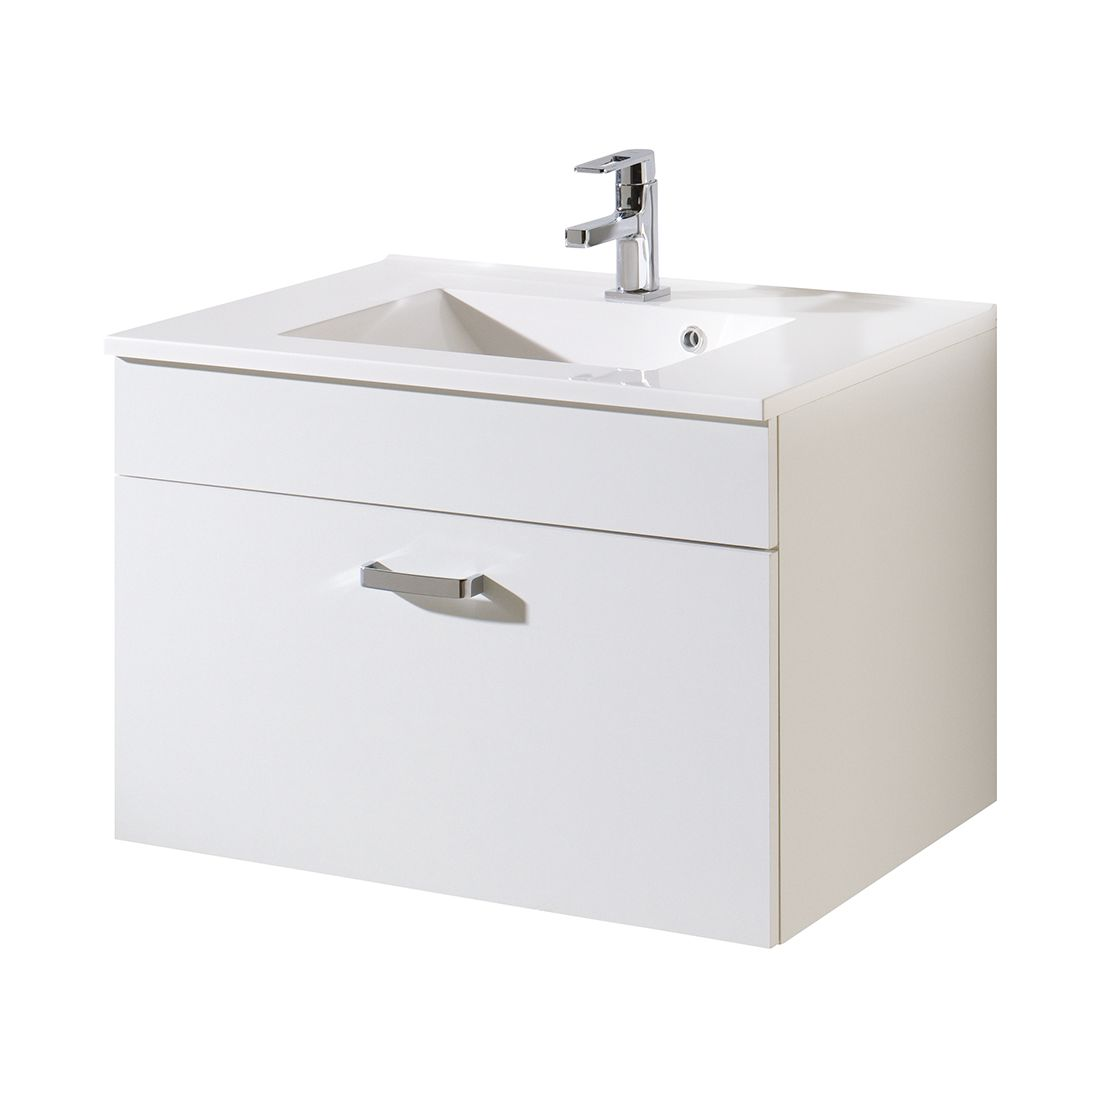 Prix des meuble vasque 23 for Prix meuble vasque